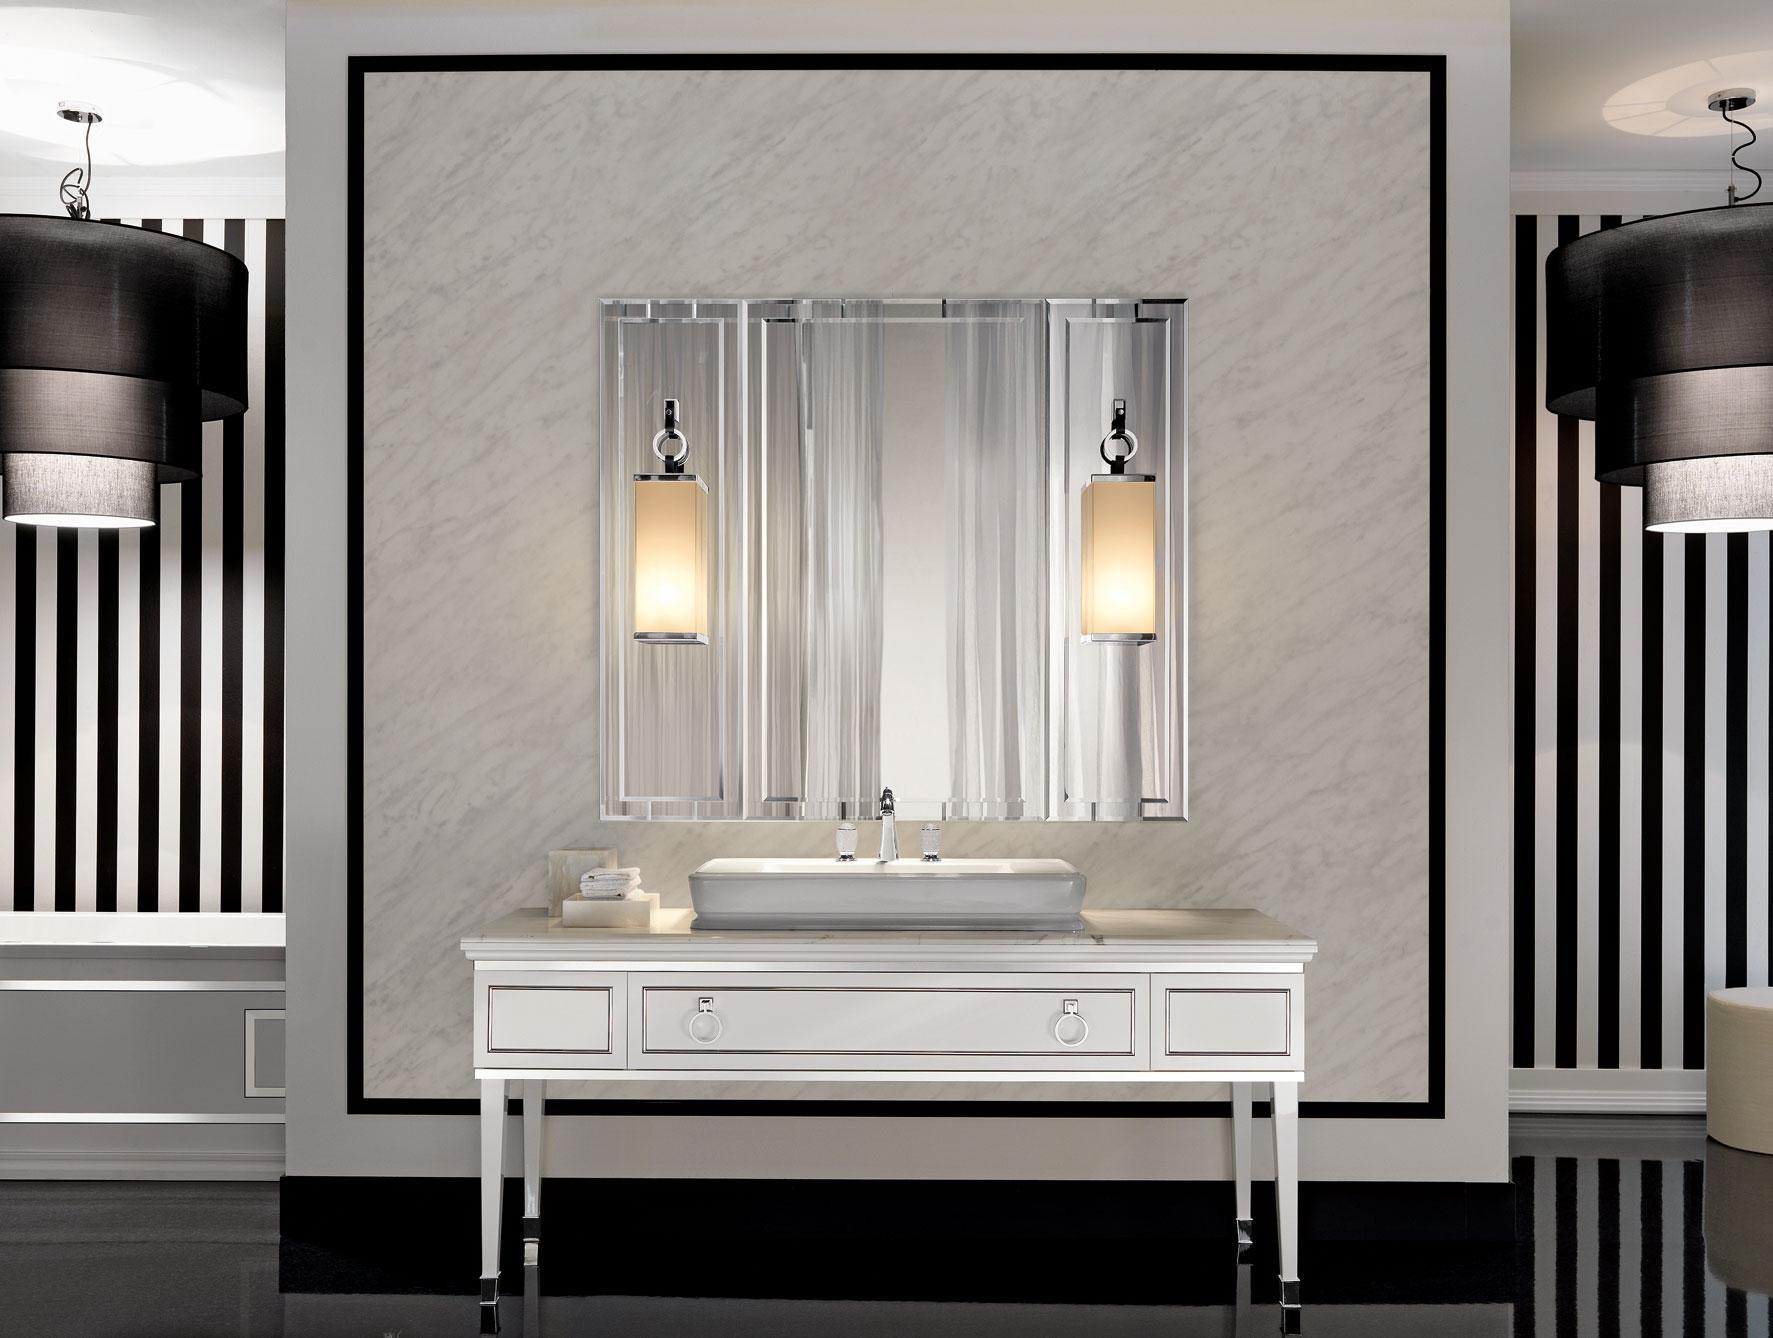 Bathroom Original Style Artworks Mackintosh Bathroom Art Deco Pertaining To Art Deco Style Bathroom Mirrors (View 12 of 15)